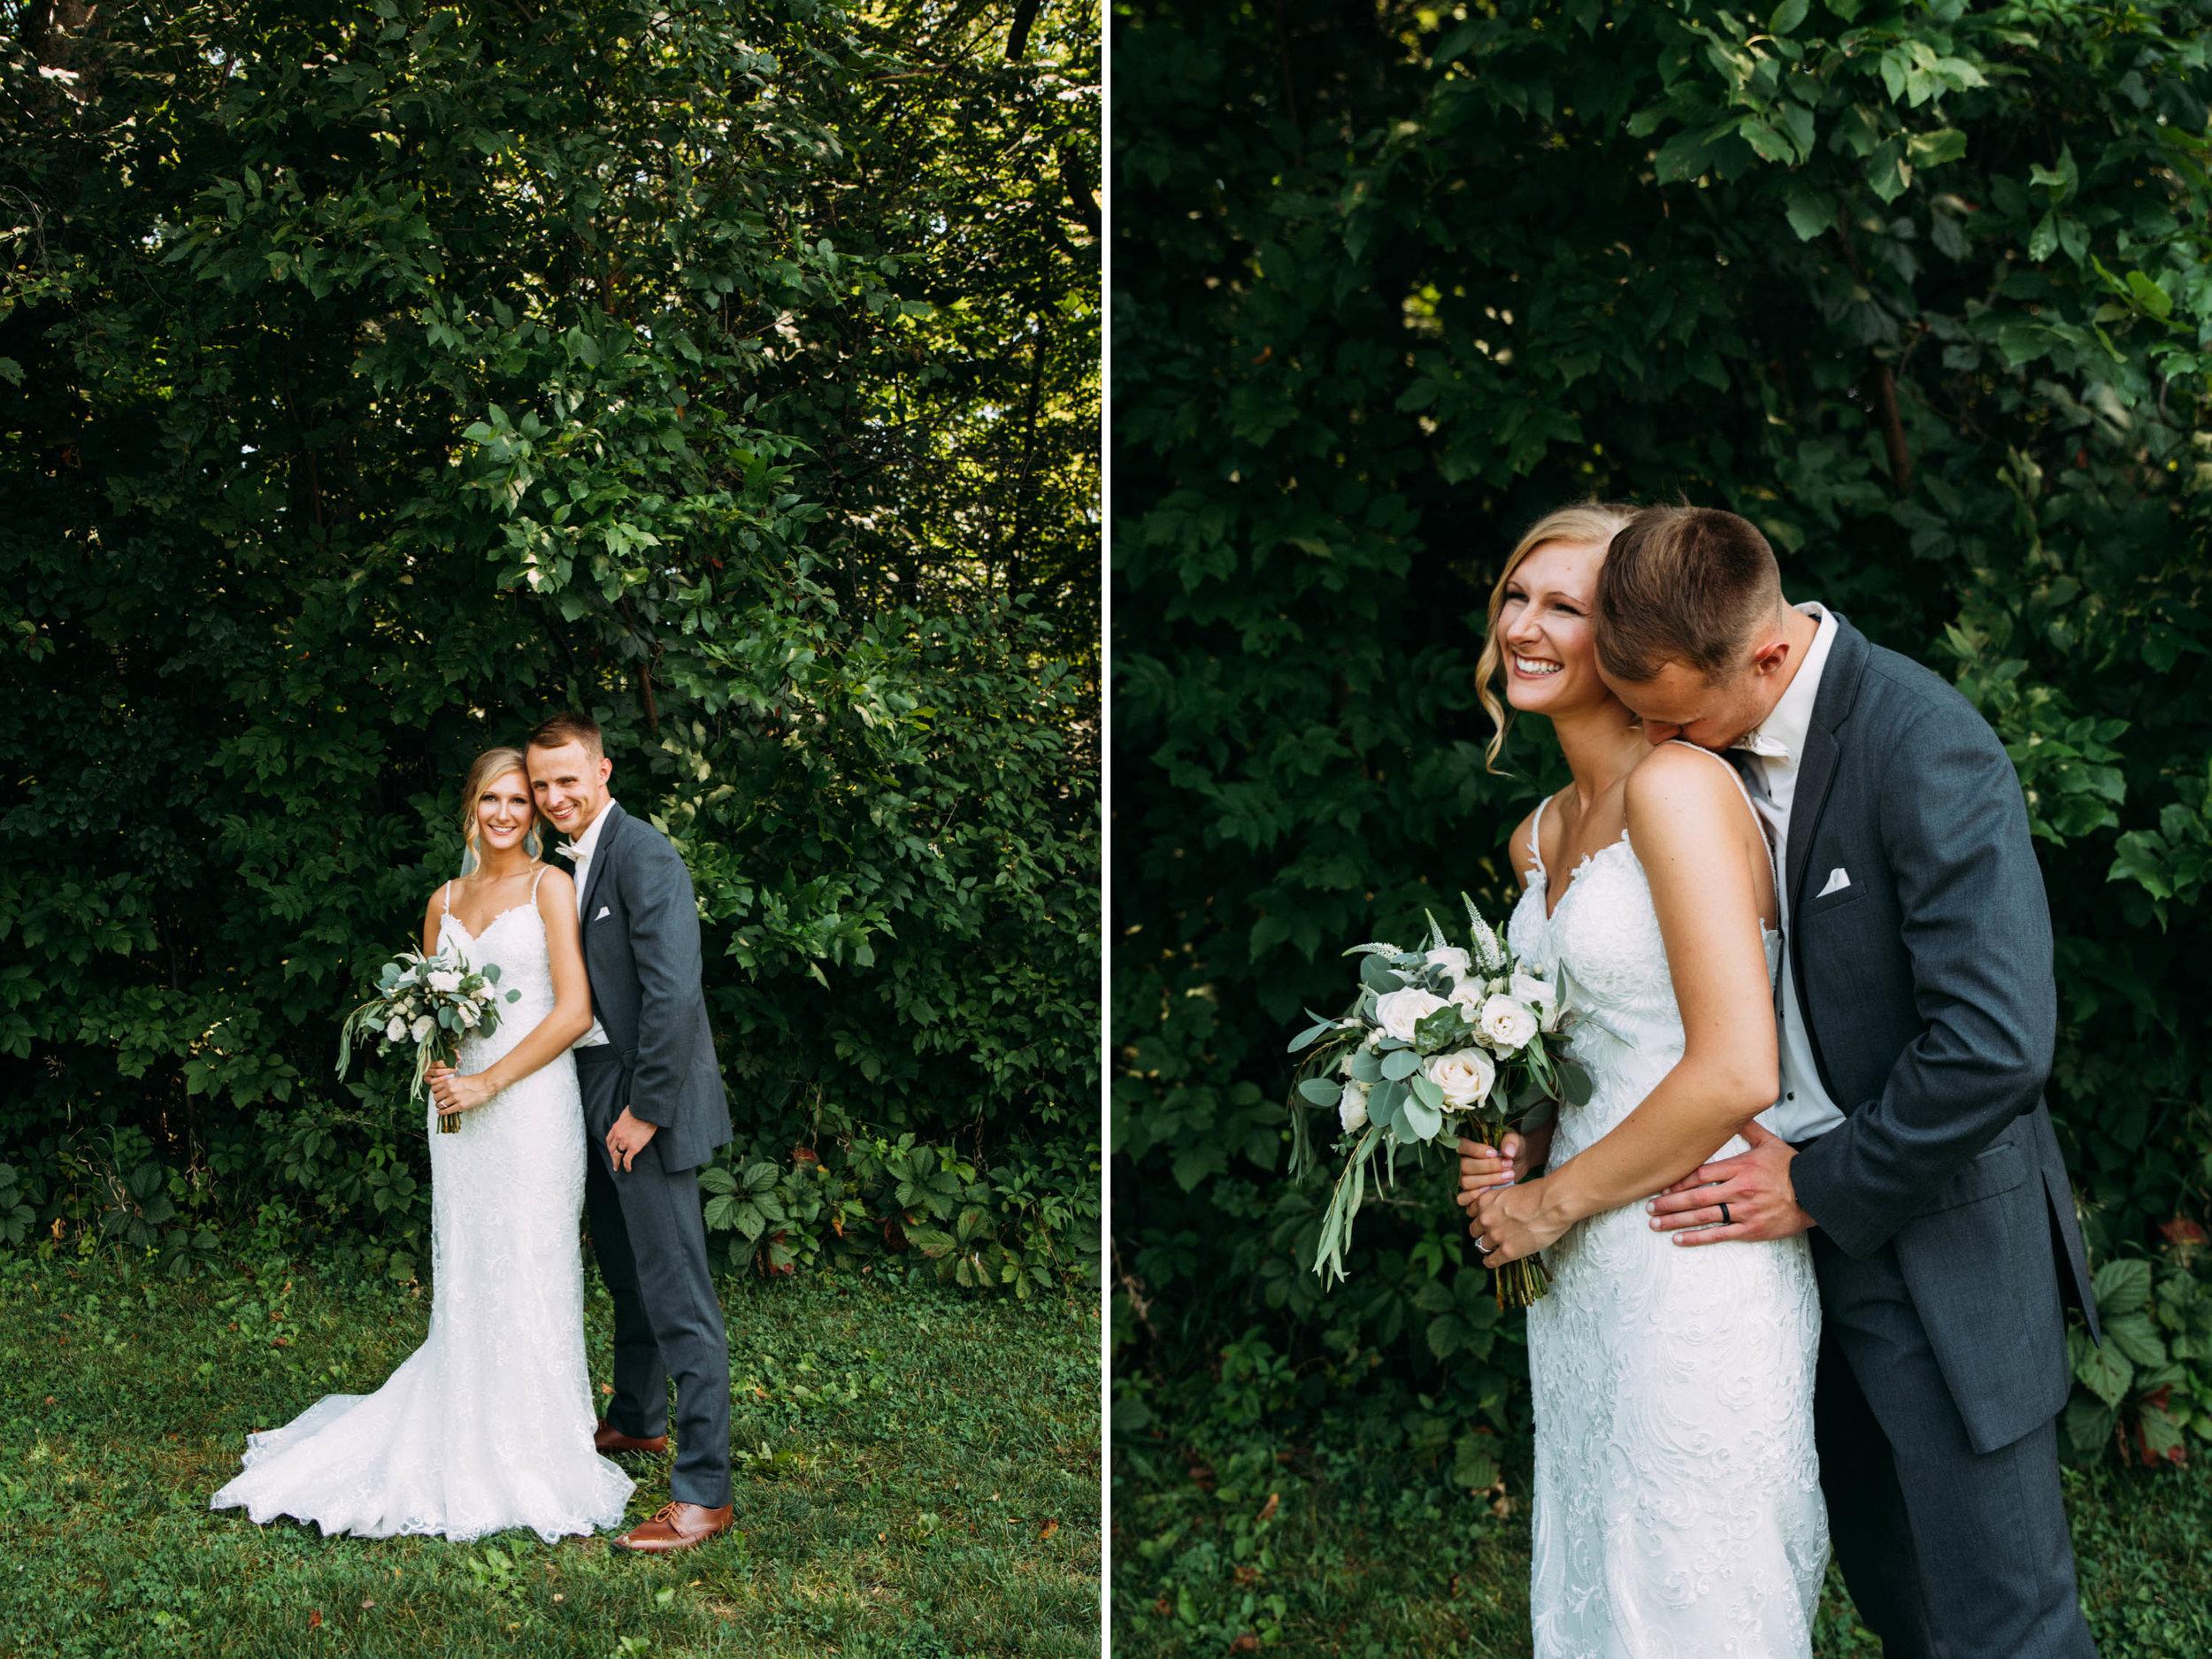 8-Minnetonka Orchards Wedding Ashley Bryce Blog.jpg